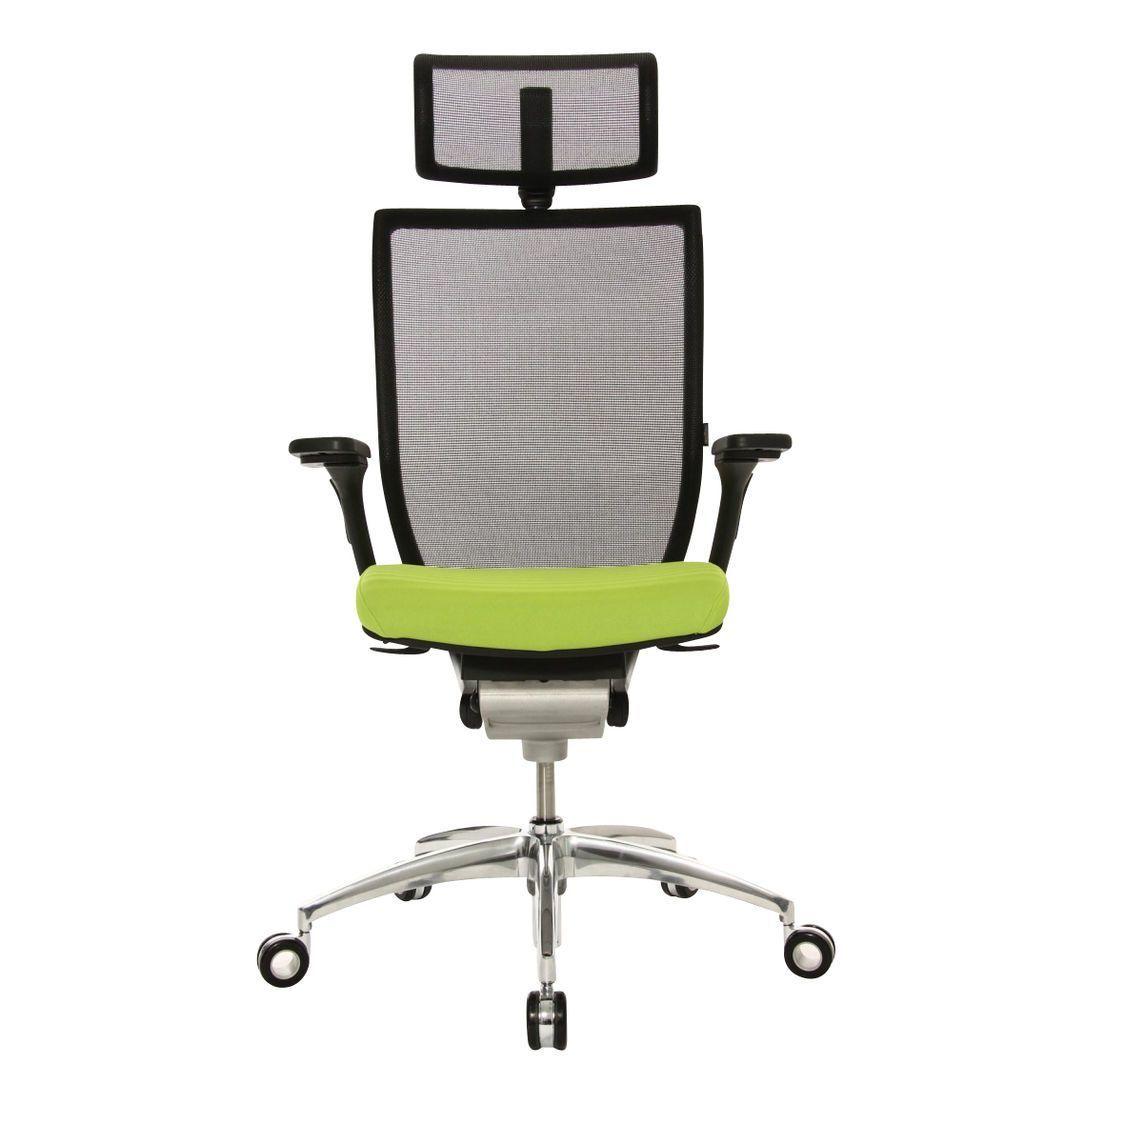 Titan 10 Silla De Oficina Wagner Ambientedirect Com # Muebles De Oficina Wagner